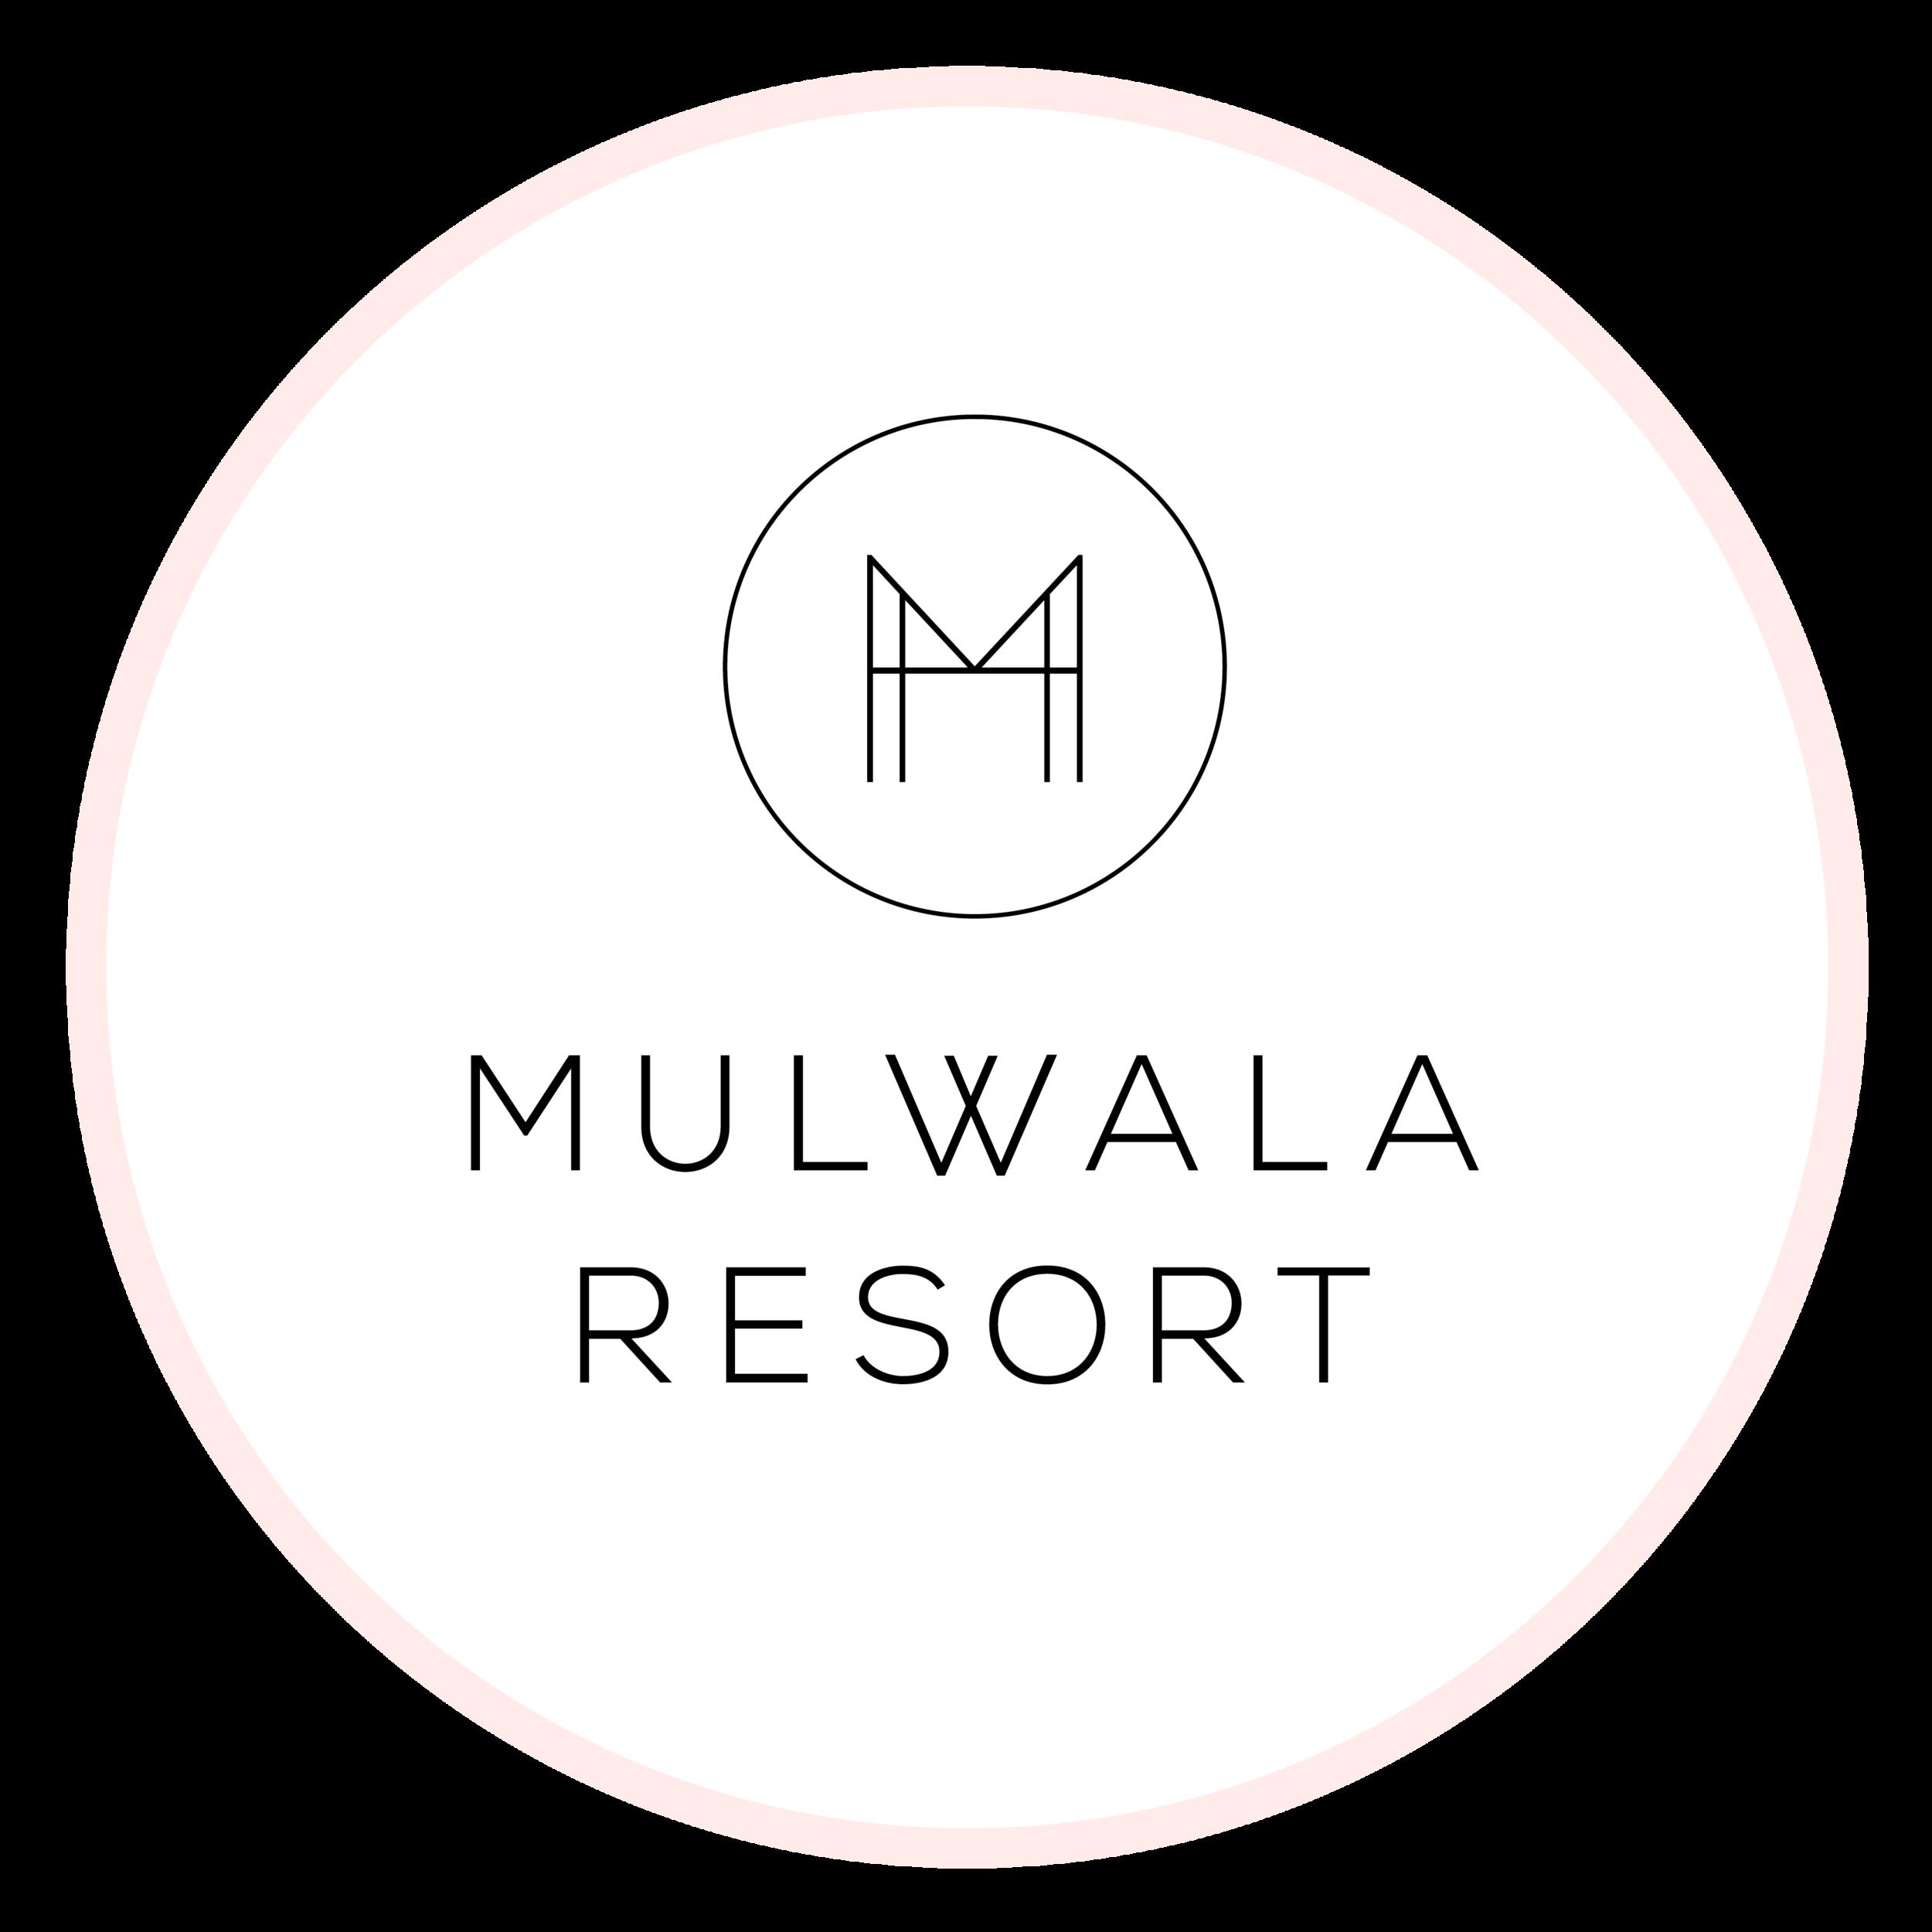 Mulwala Resort and The WHO